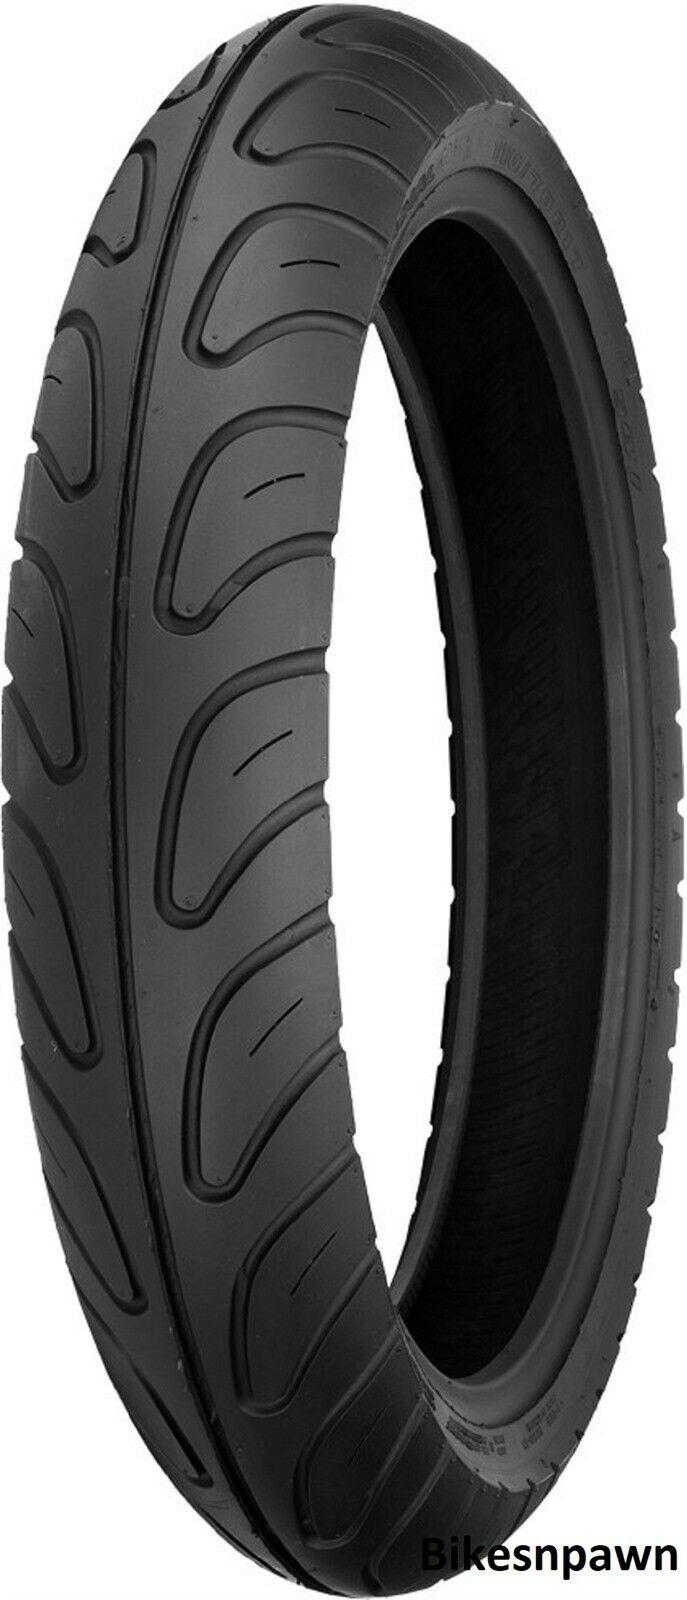 New Shinko 006 Podium Radial 120/70ZR17 Front Motorcycle Performance Tire 58W